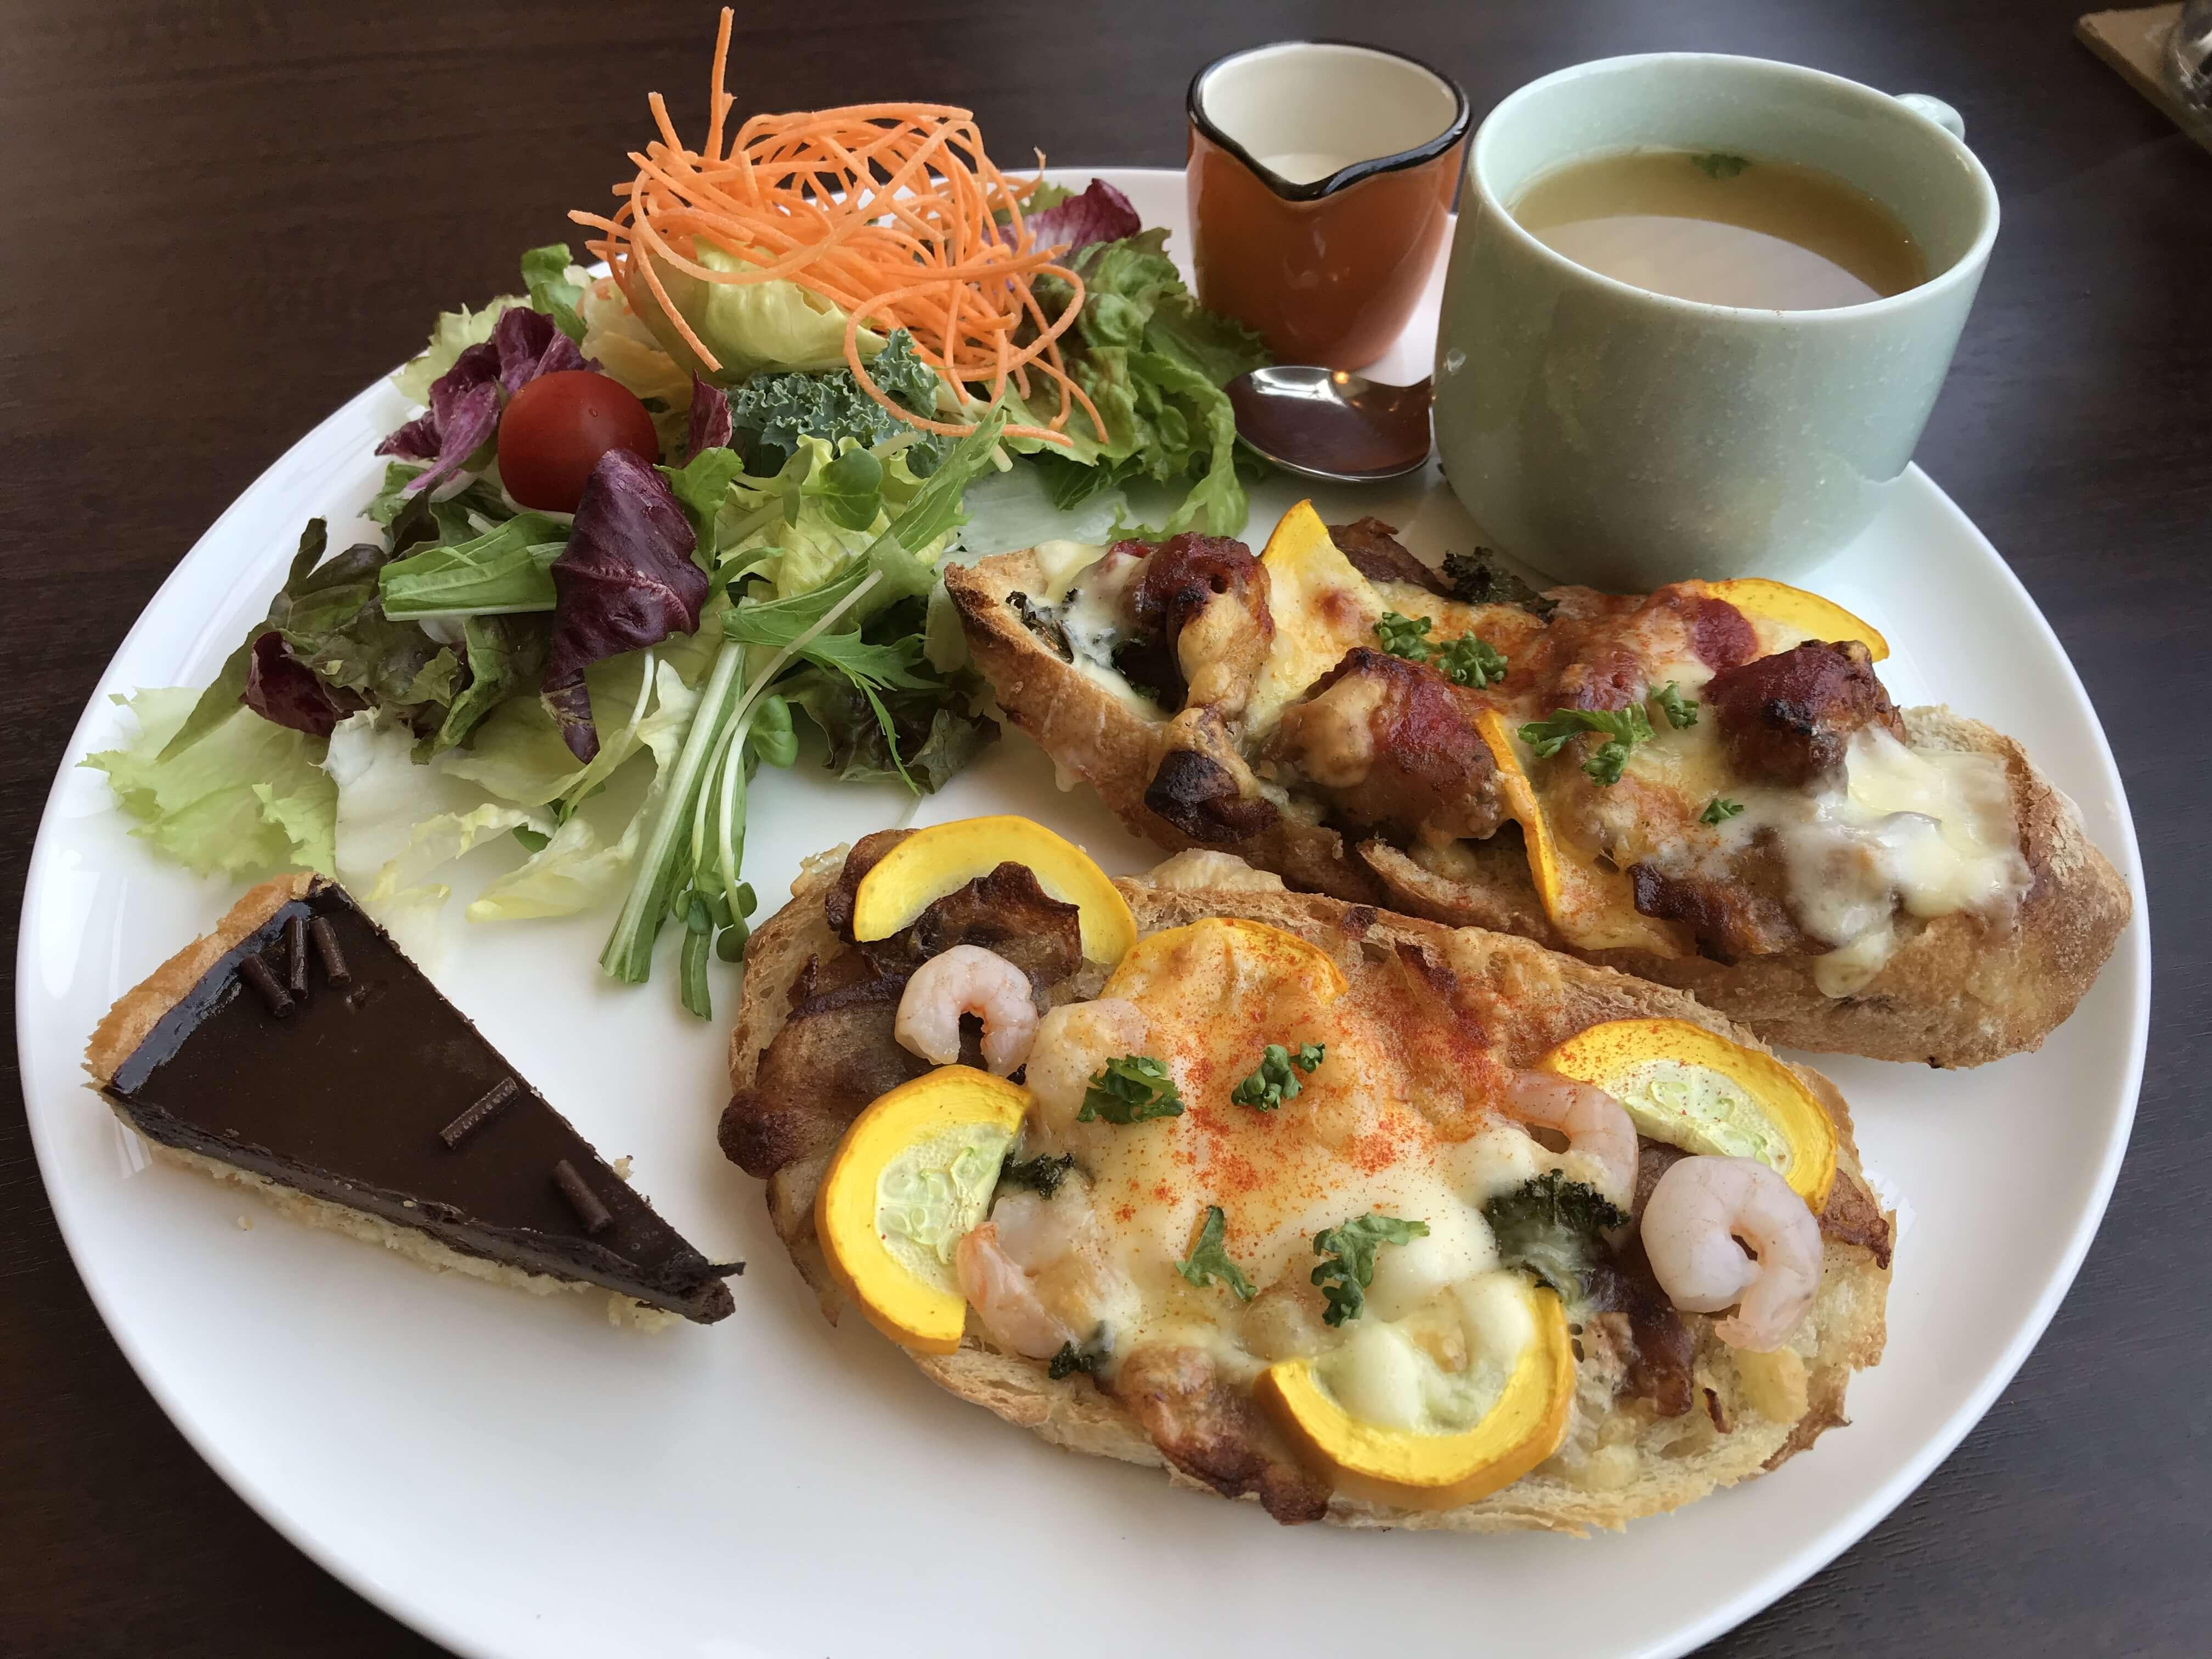 『MALIBU cafe 富樫店 マリブカフェ』ボリュームたっぷりのオープンサンドランチで大満足!断面が美しいサンドイッチのテイクアウトも